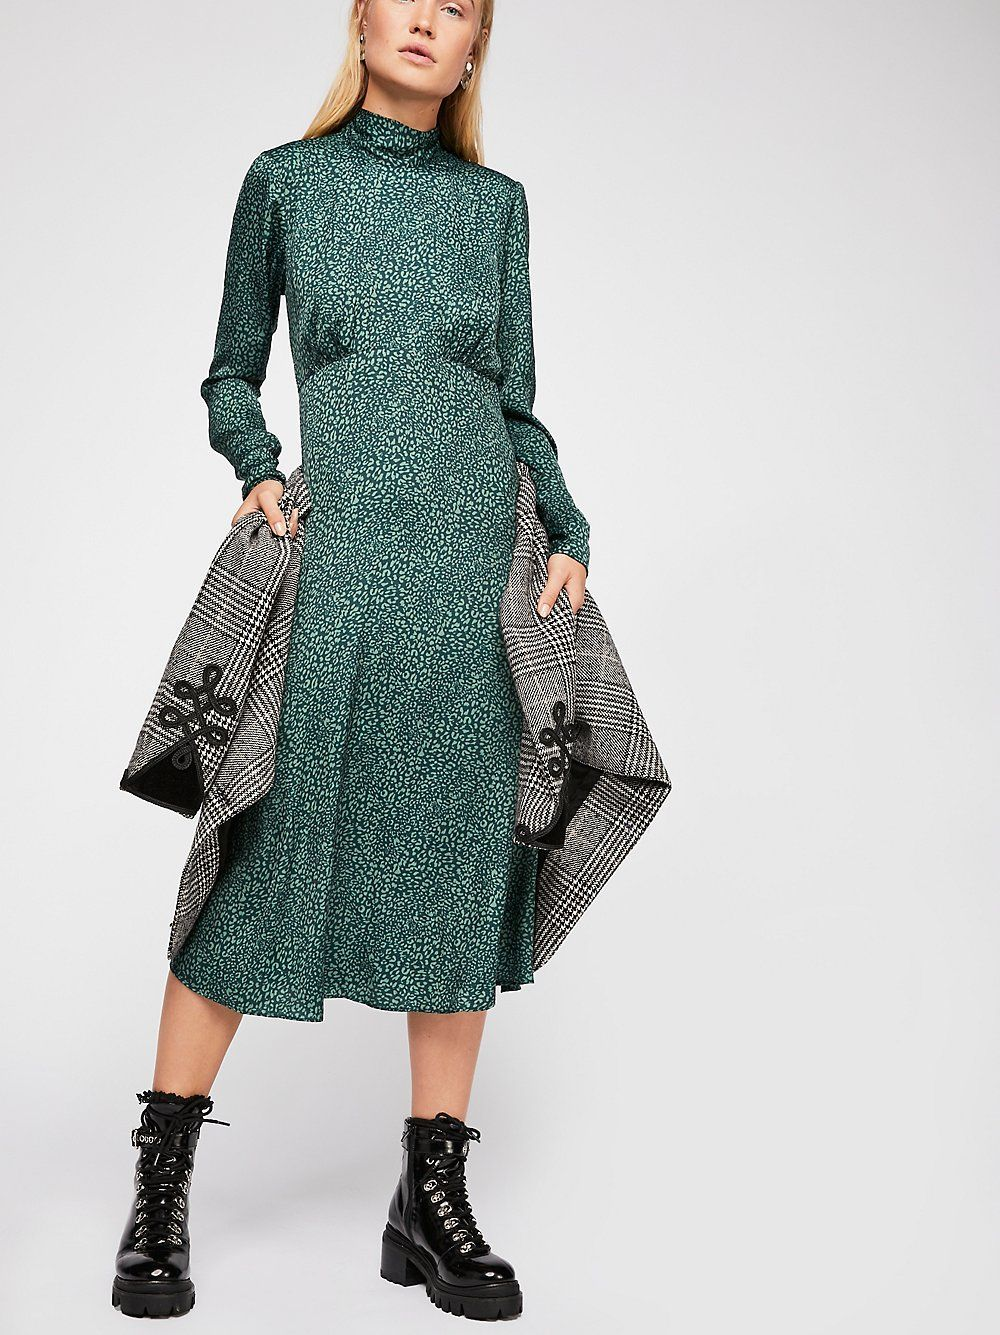 528b04bb356 17 Long-Sleeve Midi Dresses For Your Winter Wardrobe Consideration + refinery29